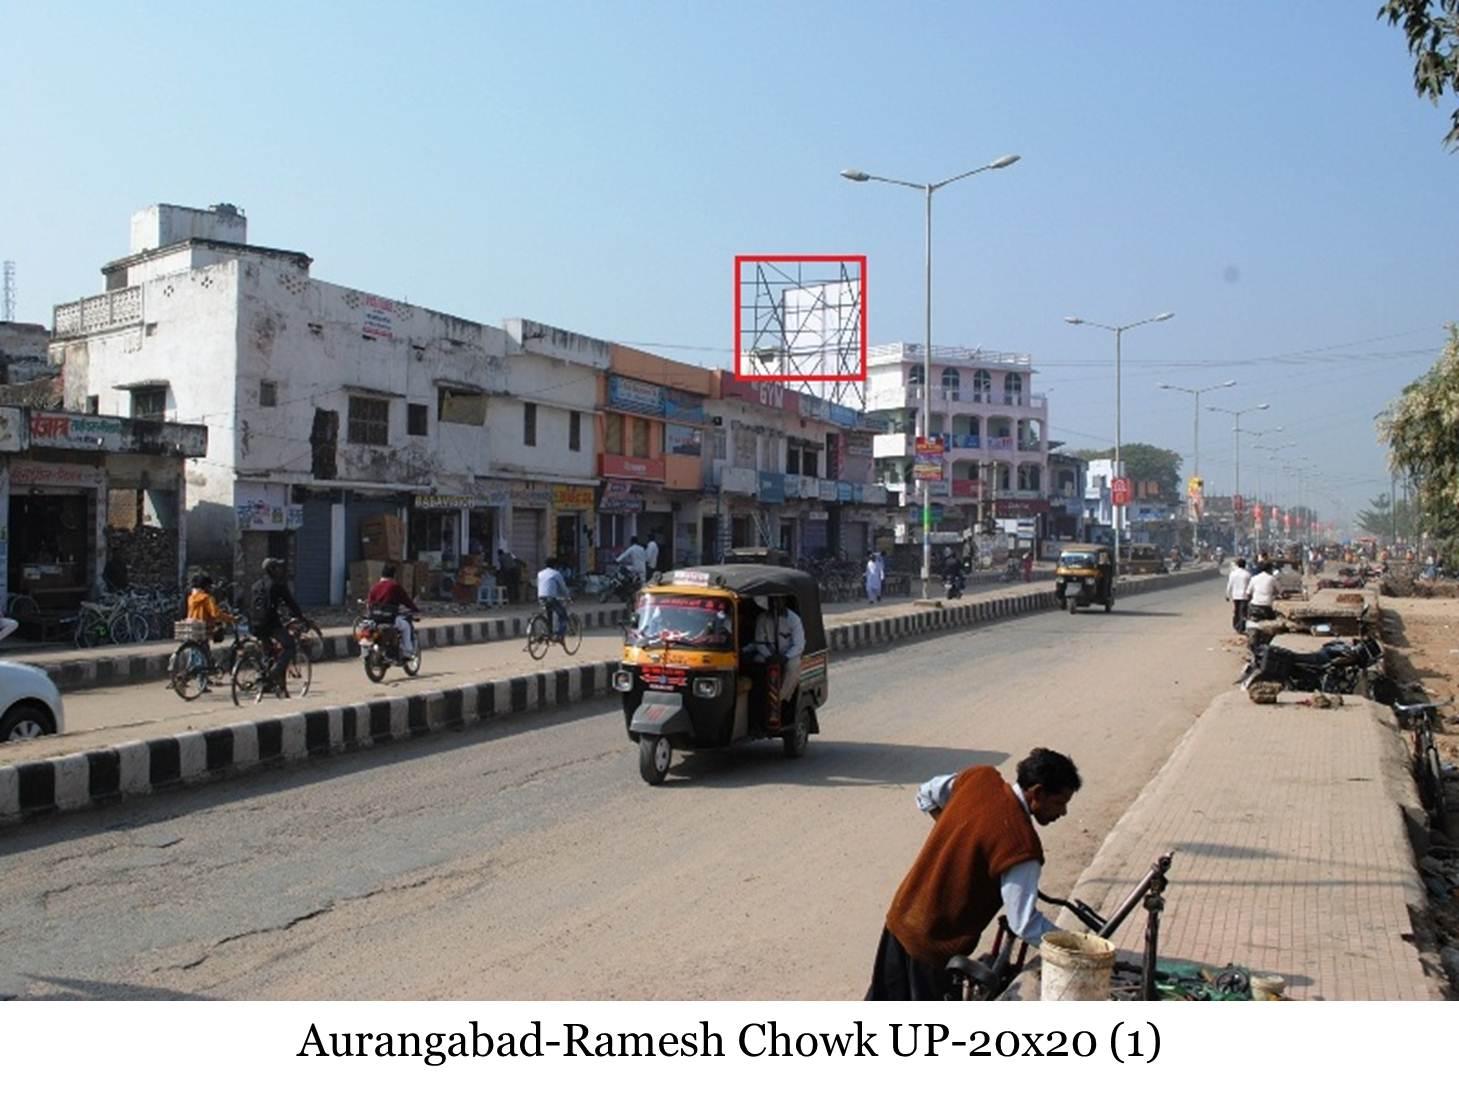 Ramesh Chowk UP, Aurangabad